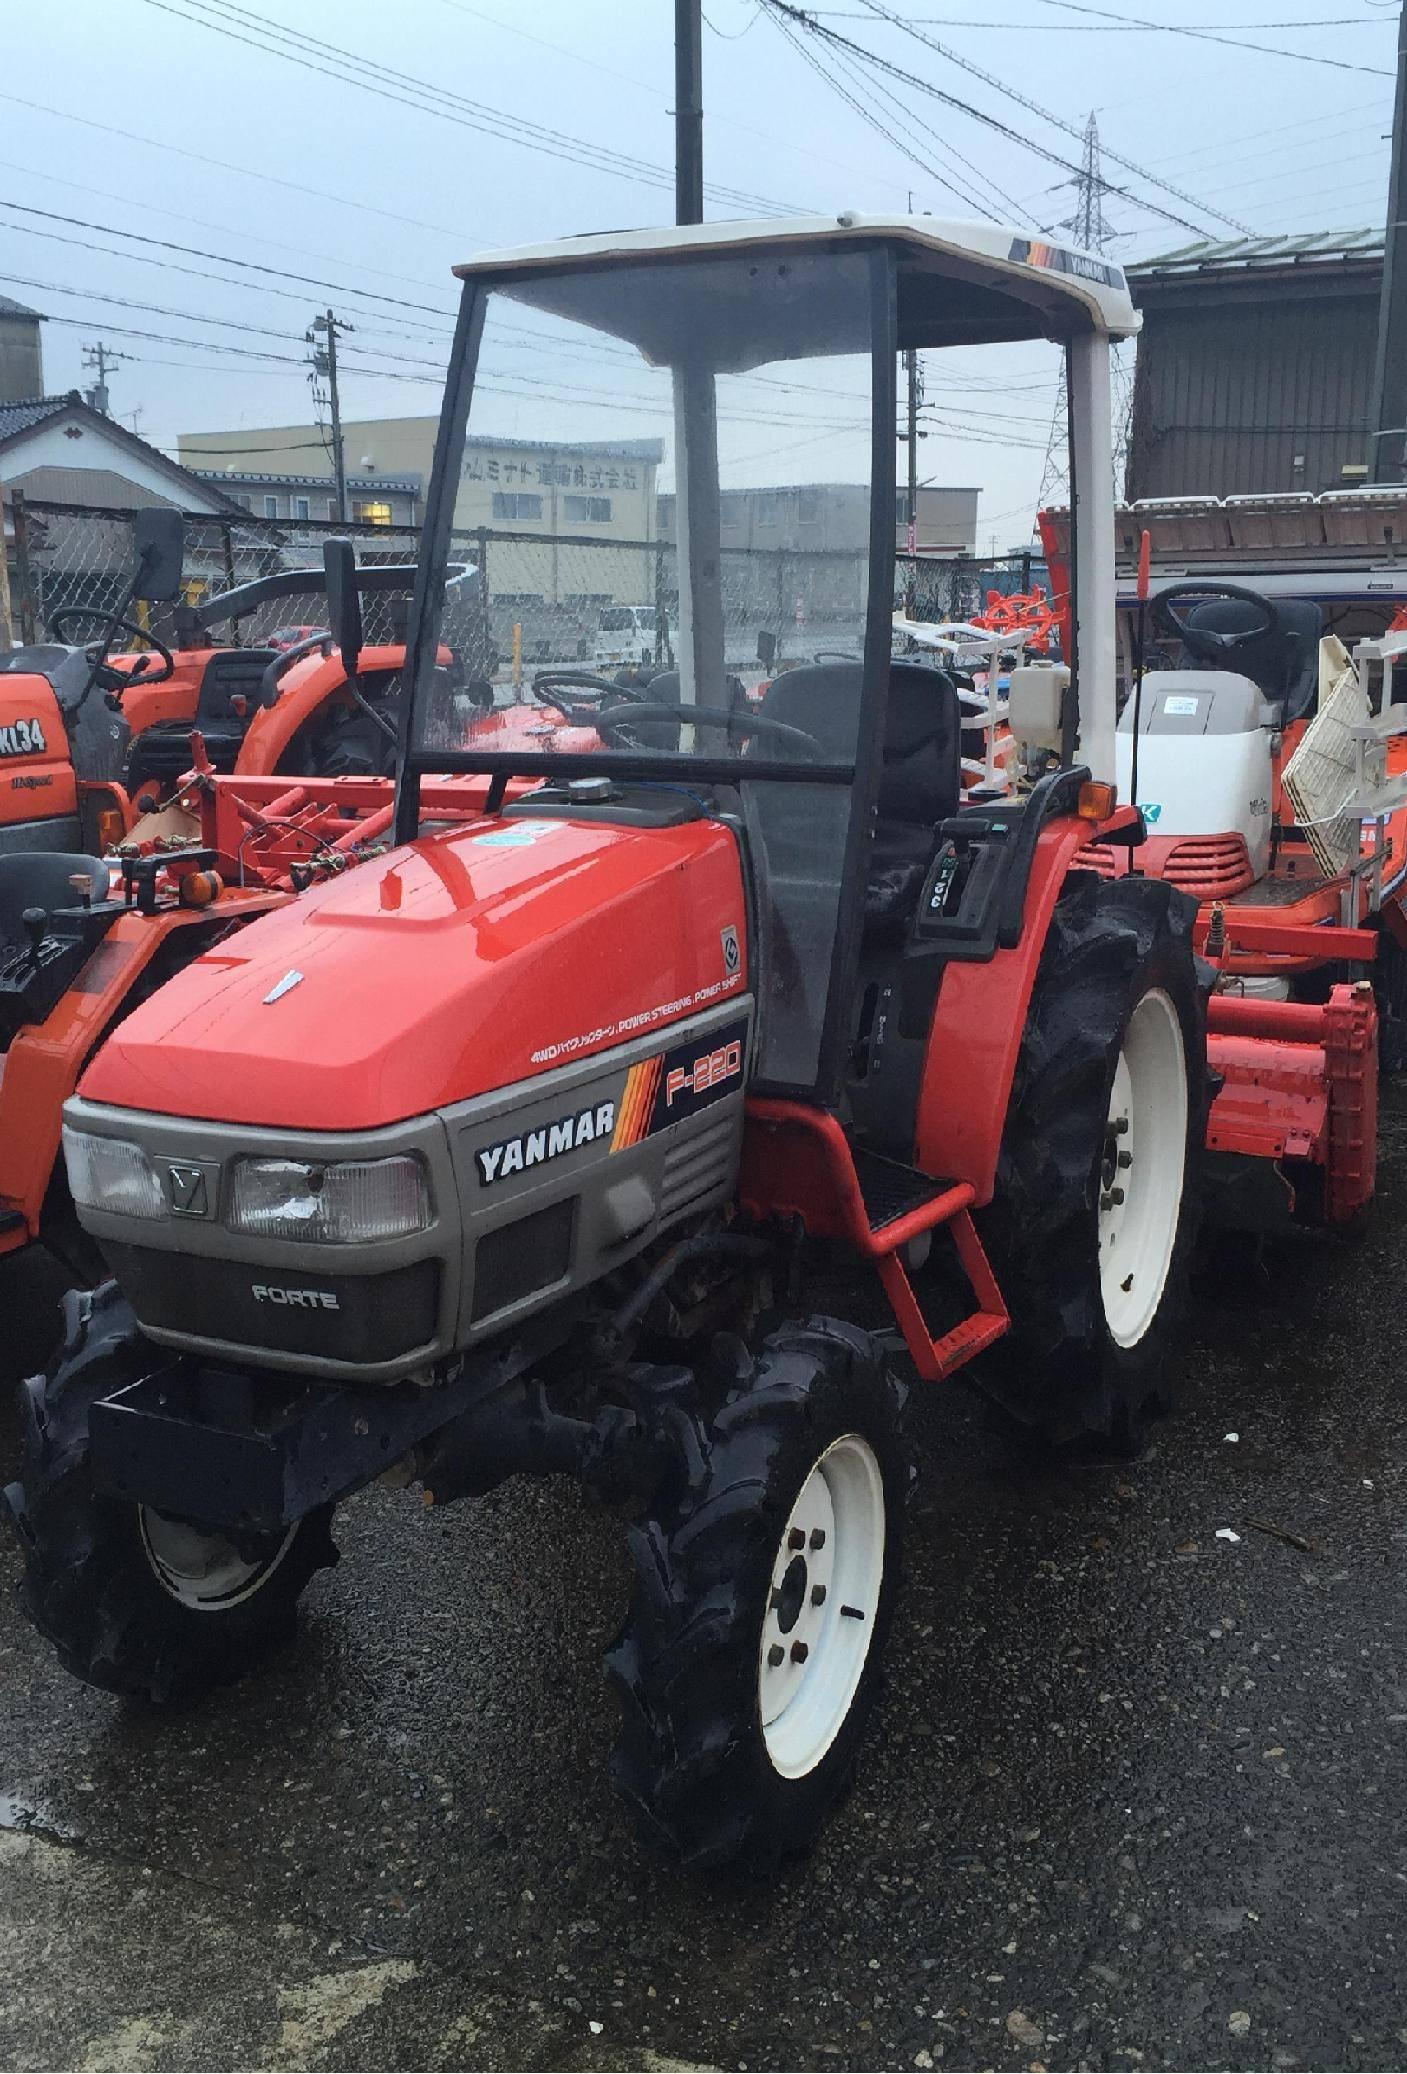 Used tractor Yanmar F-220